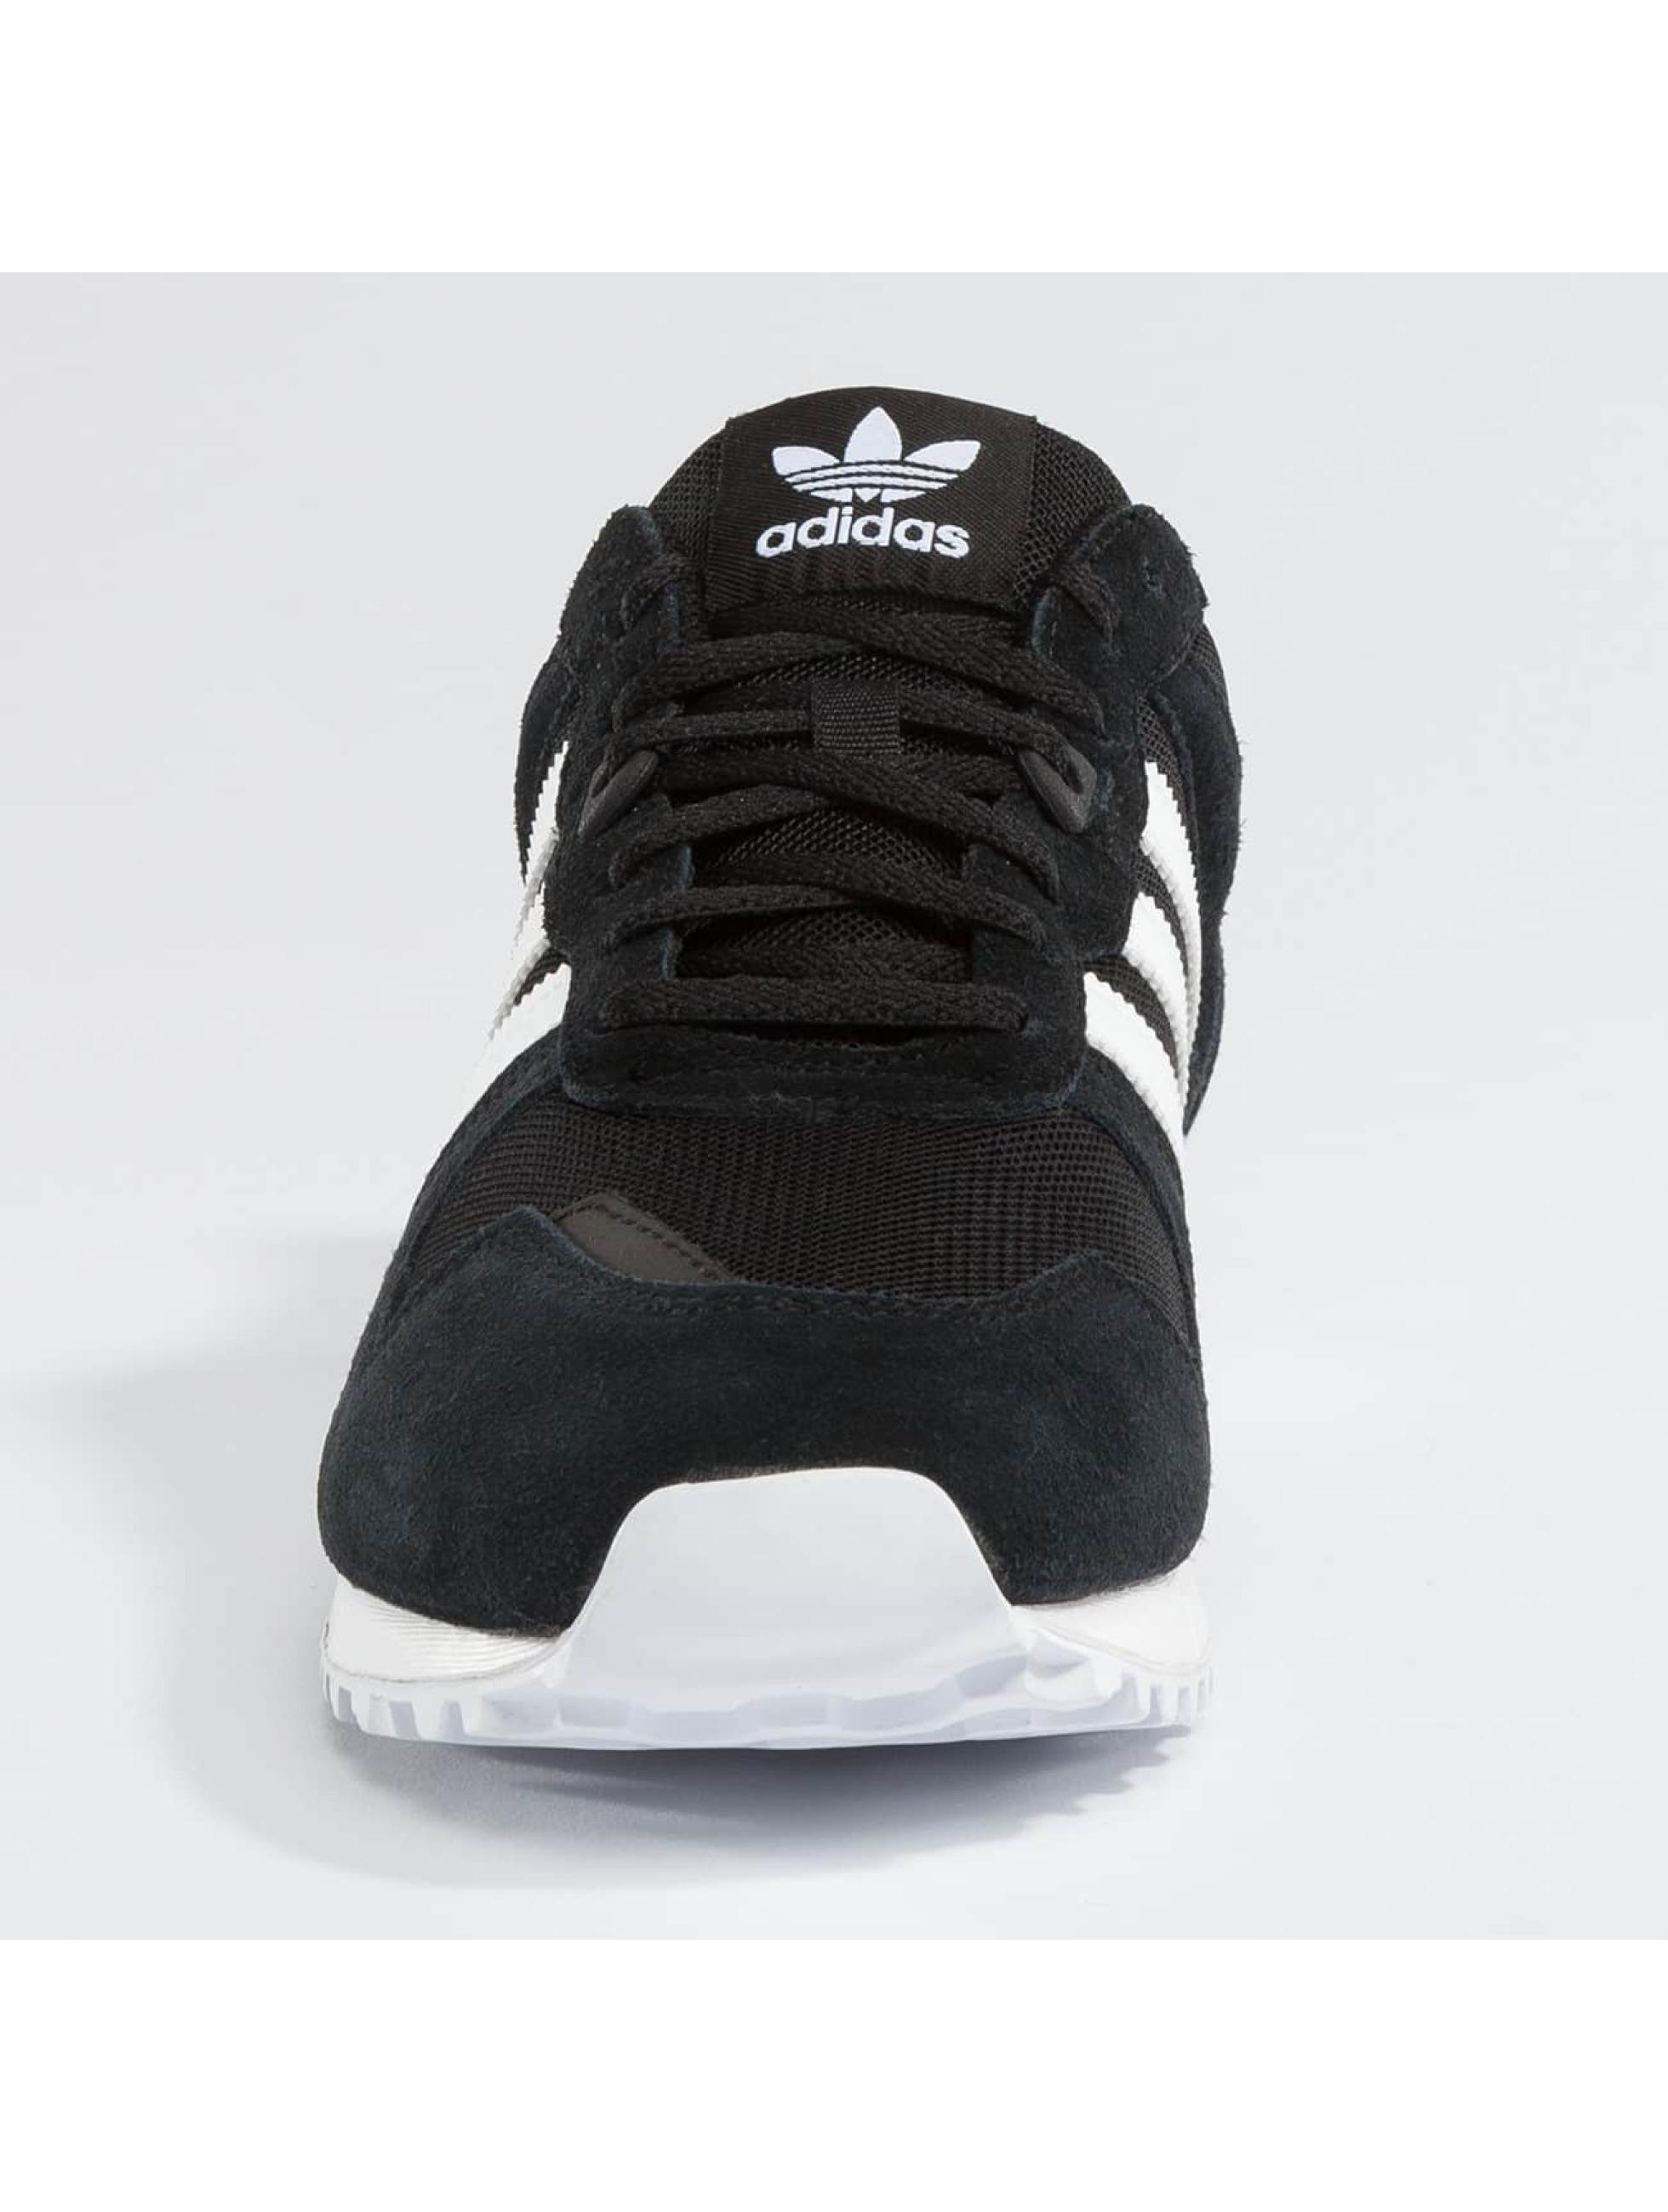 adidas Sneaker ZX 700 schwarz